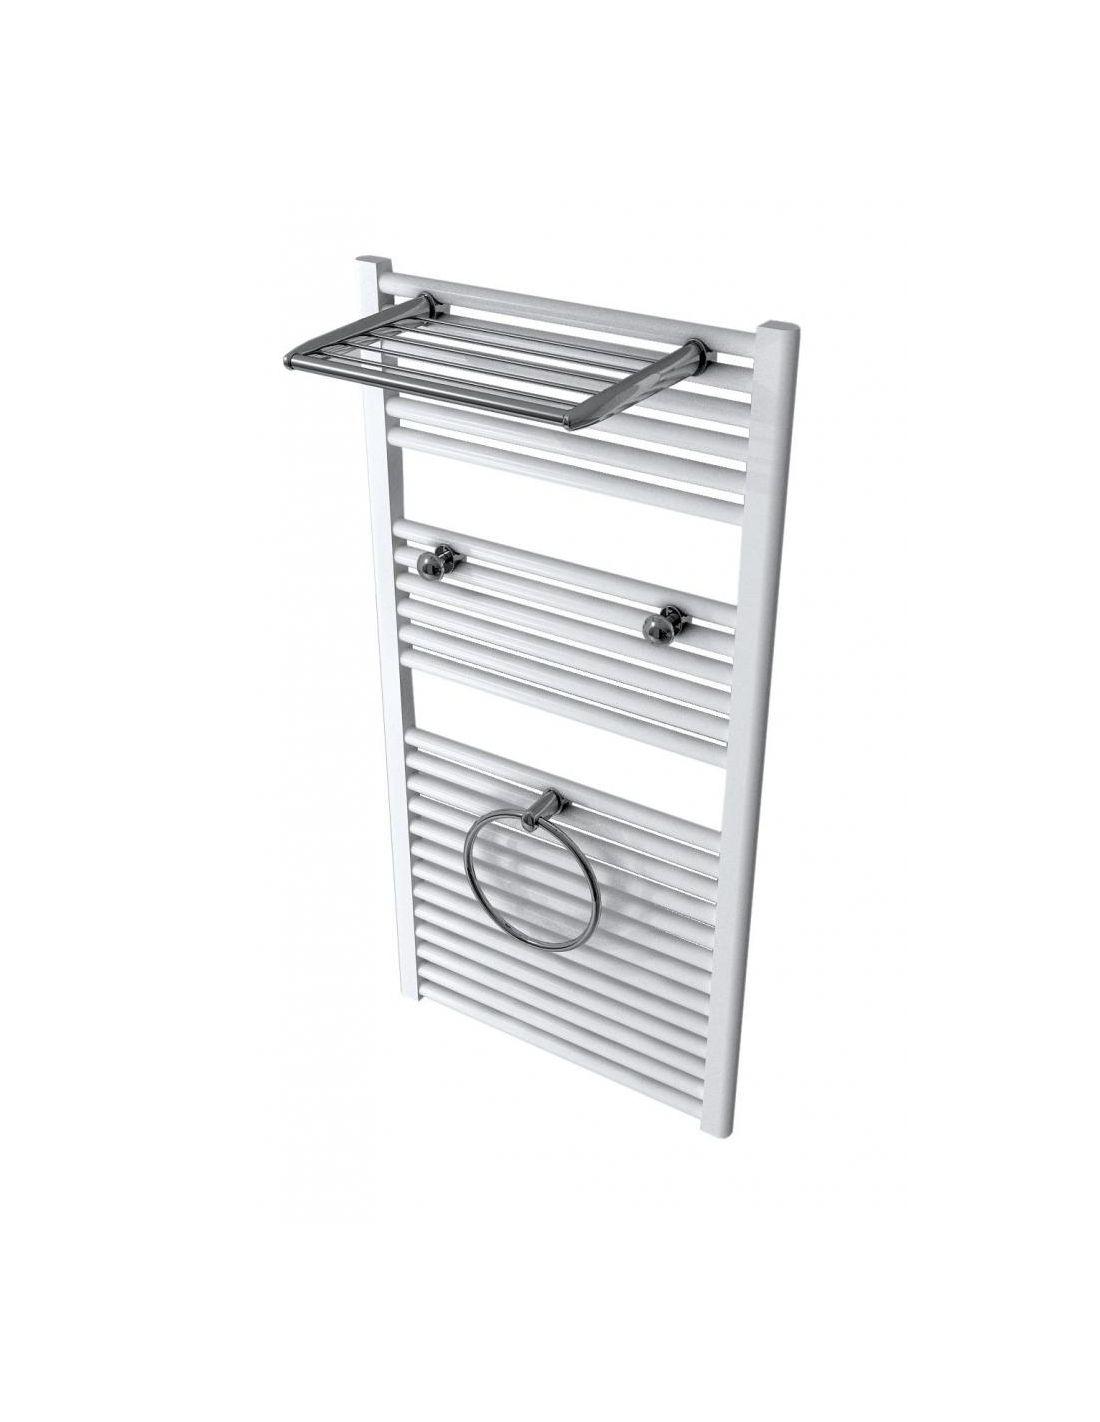 30 pezzi handy up 360 porta asciugamani arredo bagno per hotel - Porta asciugamano bagno ...